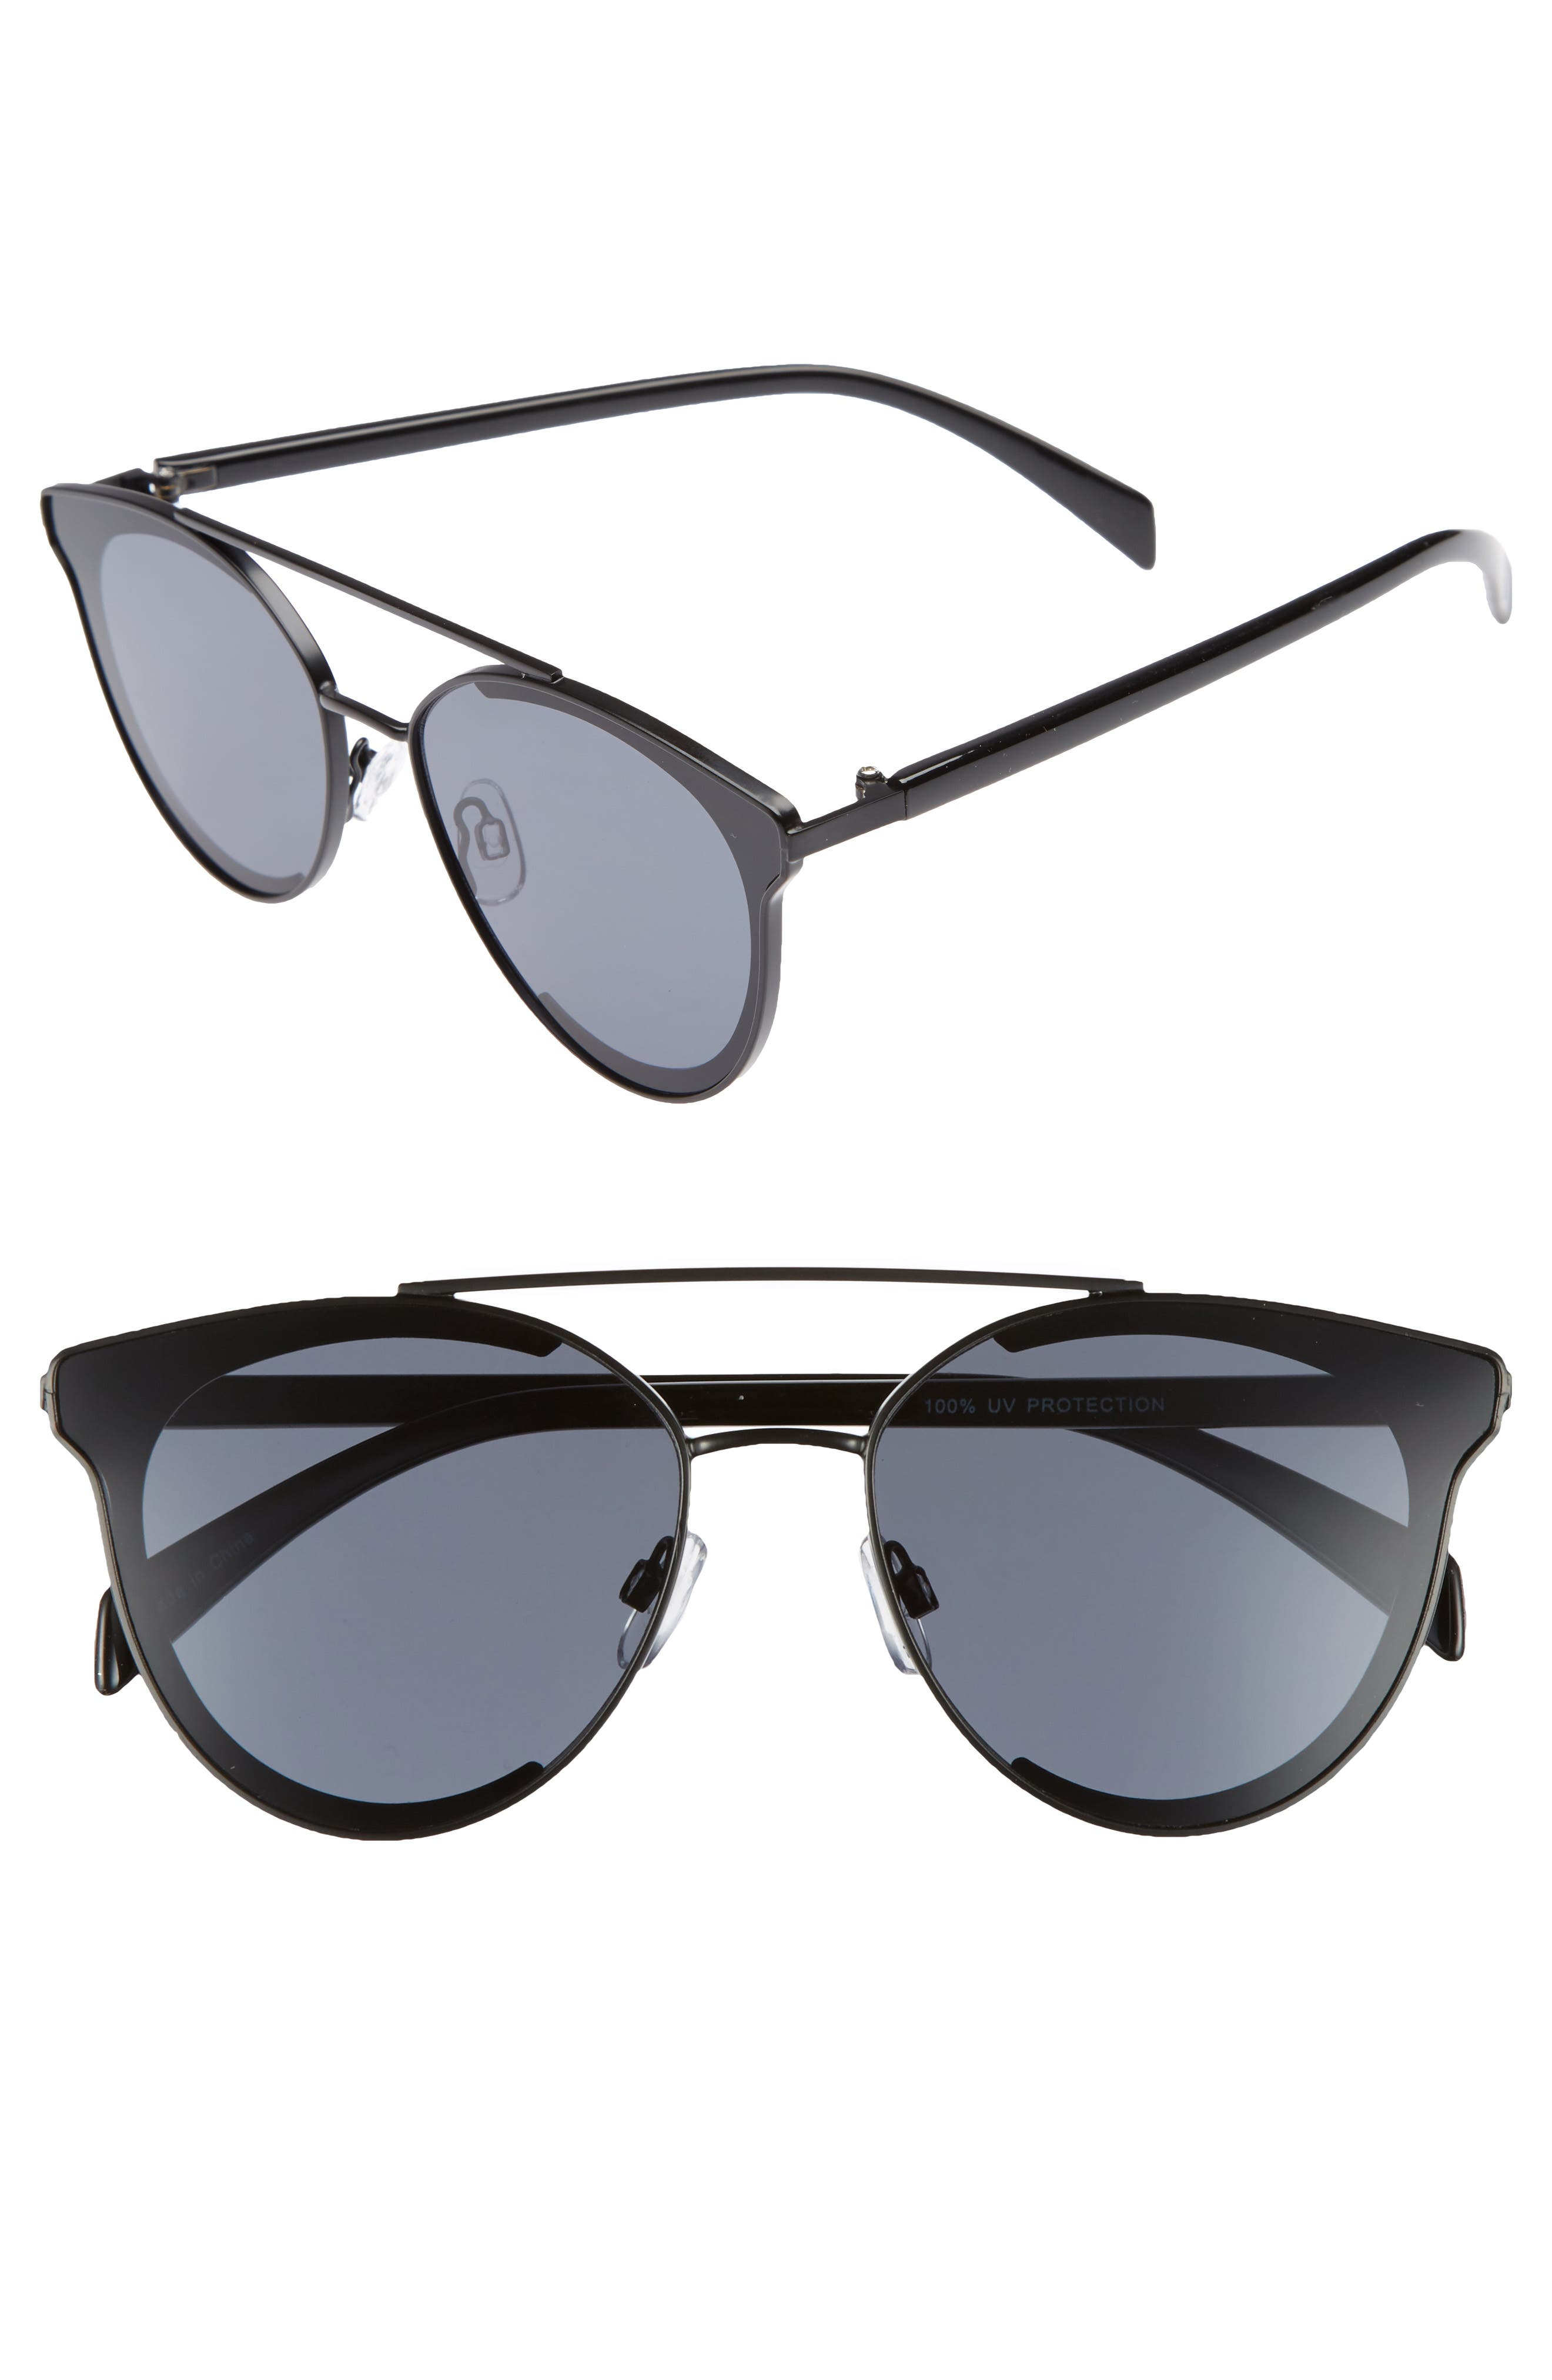 58mm Aviator Sunglasses,                             Main thumbnail 1, color,                             001